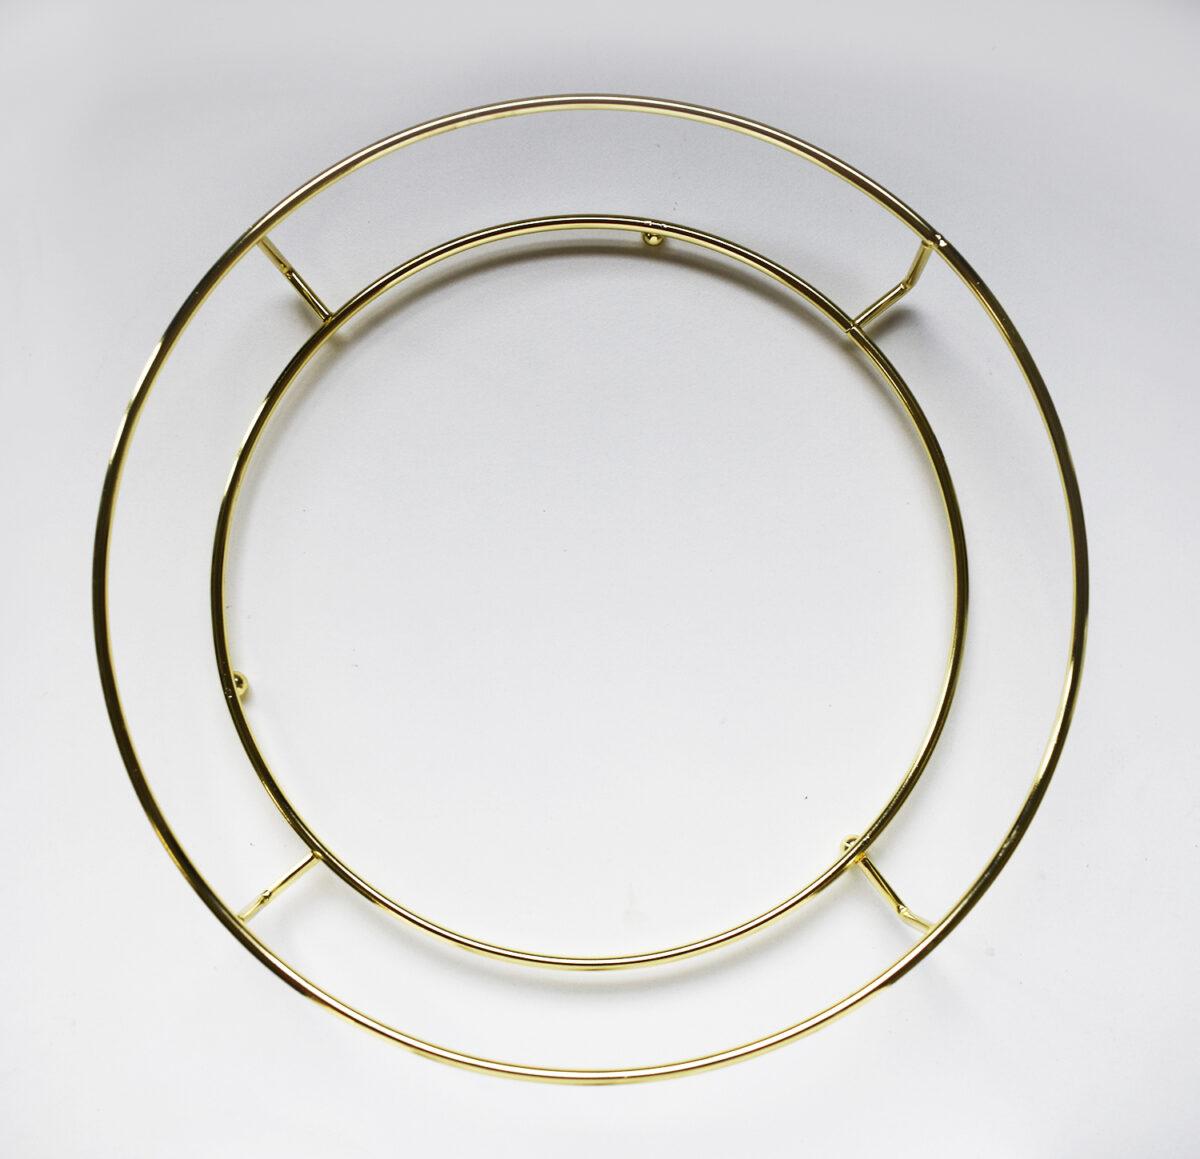 Round metal tray holder